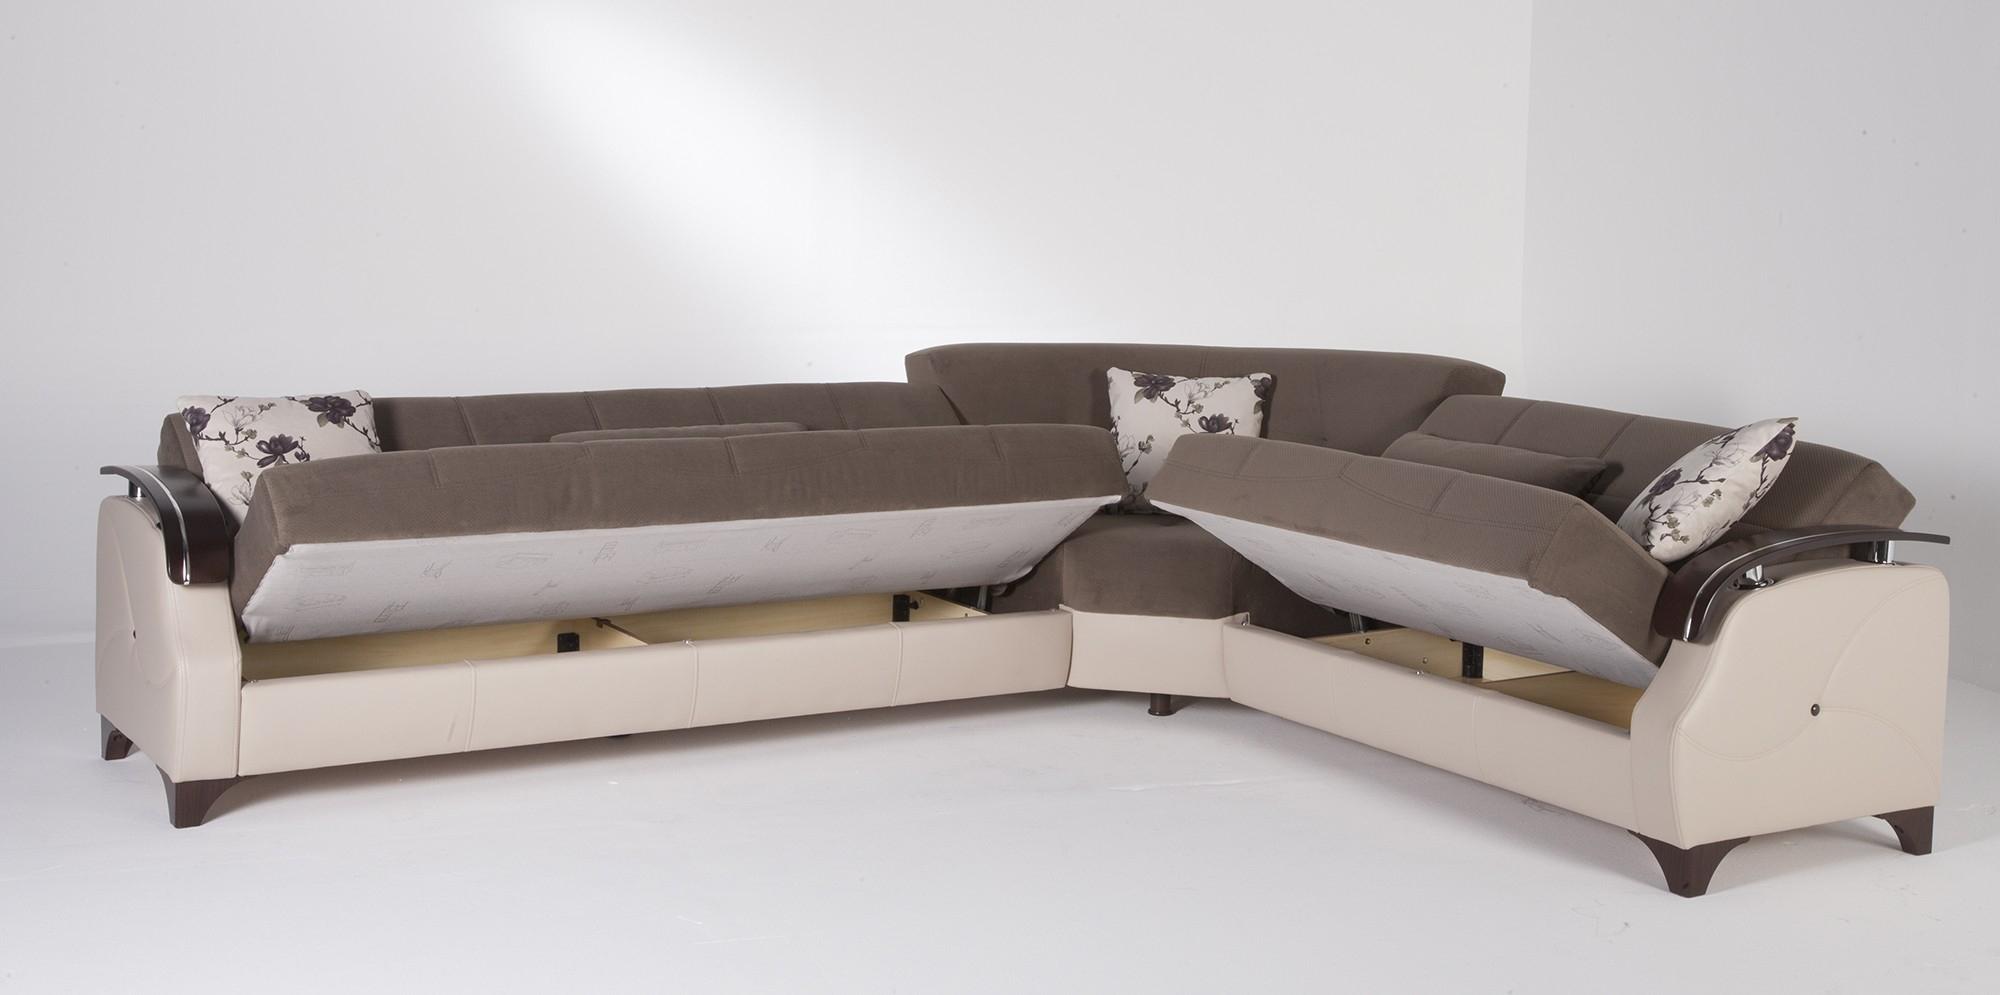 Sectional Sleeper Sofa With Storage And Sofa Sleeper Sectional With Inside Sectional Sofas With Storage (Image 6 of 10)